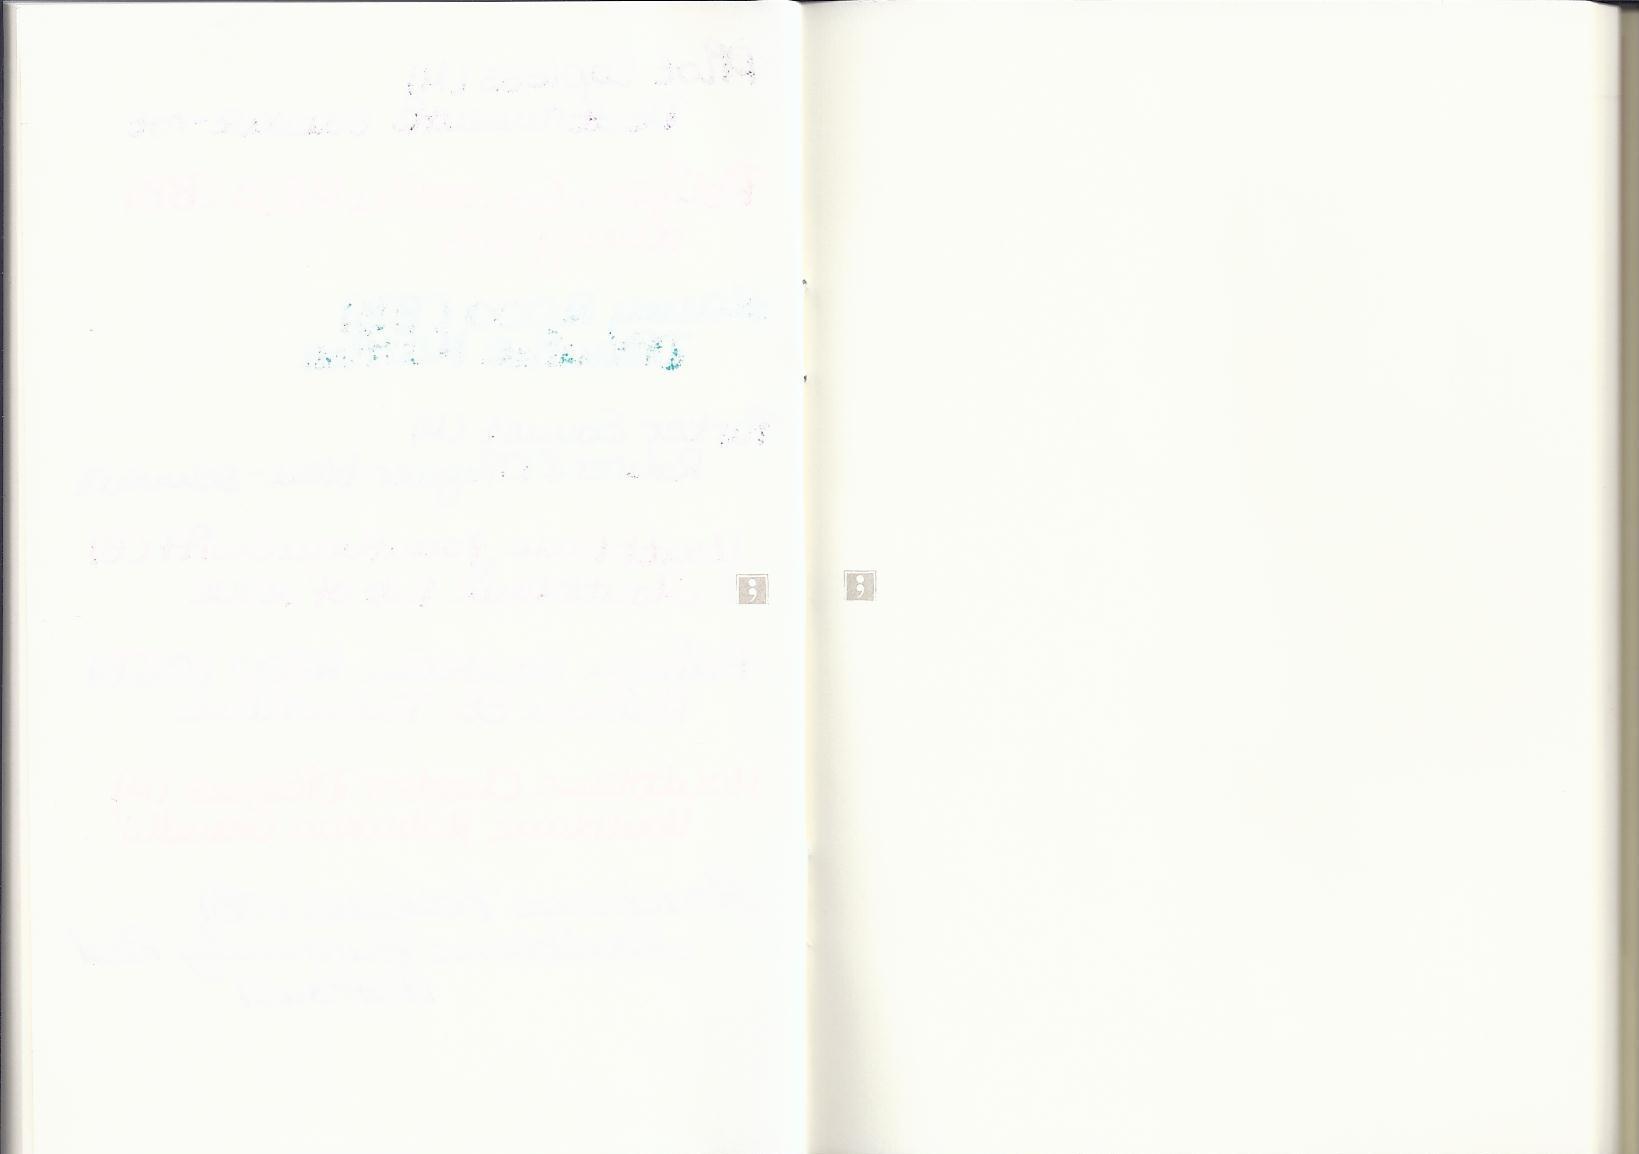 Semikolon Scan 2